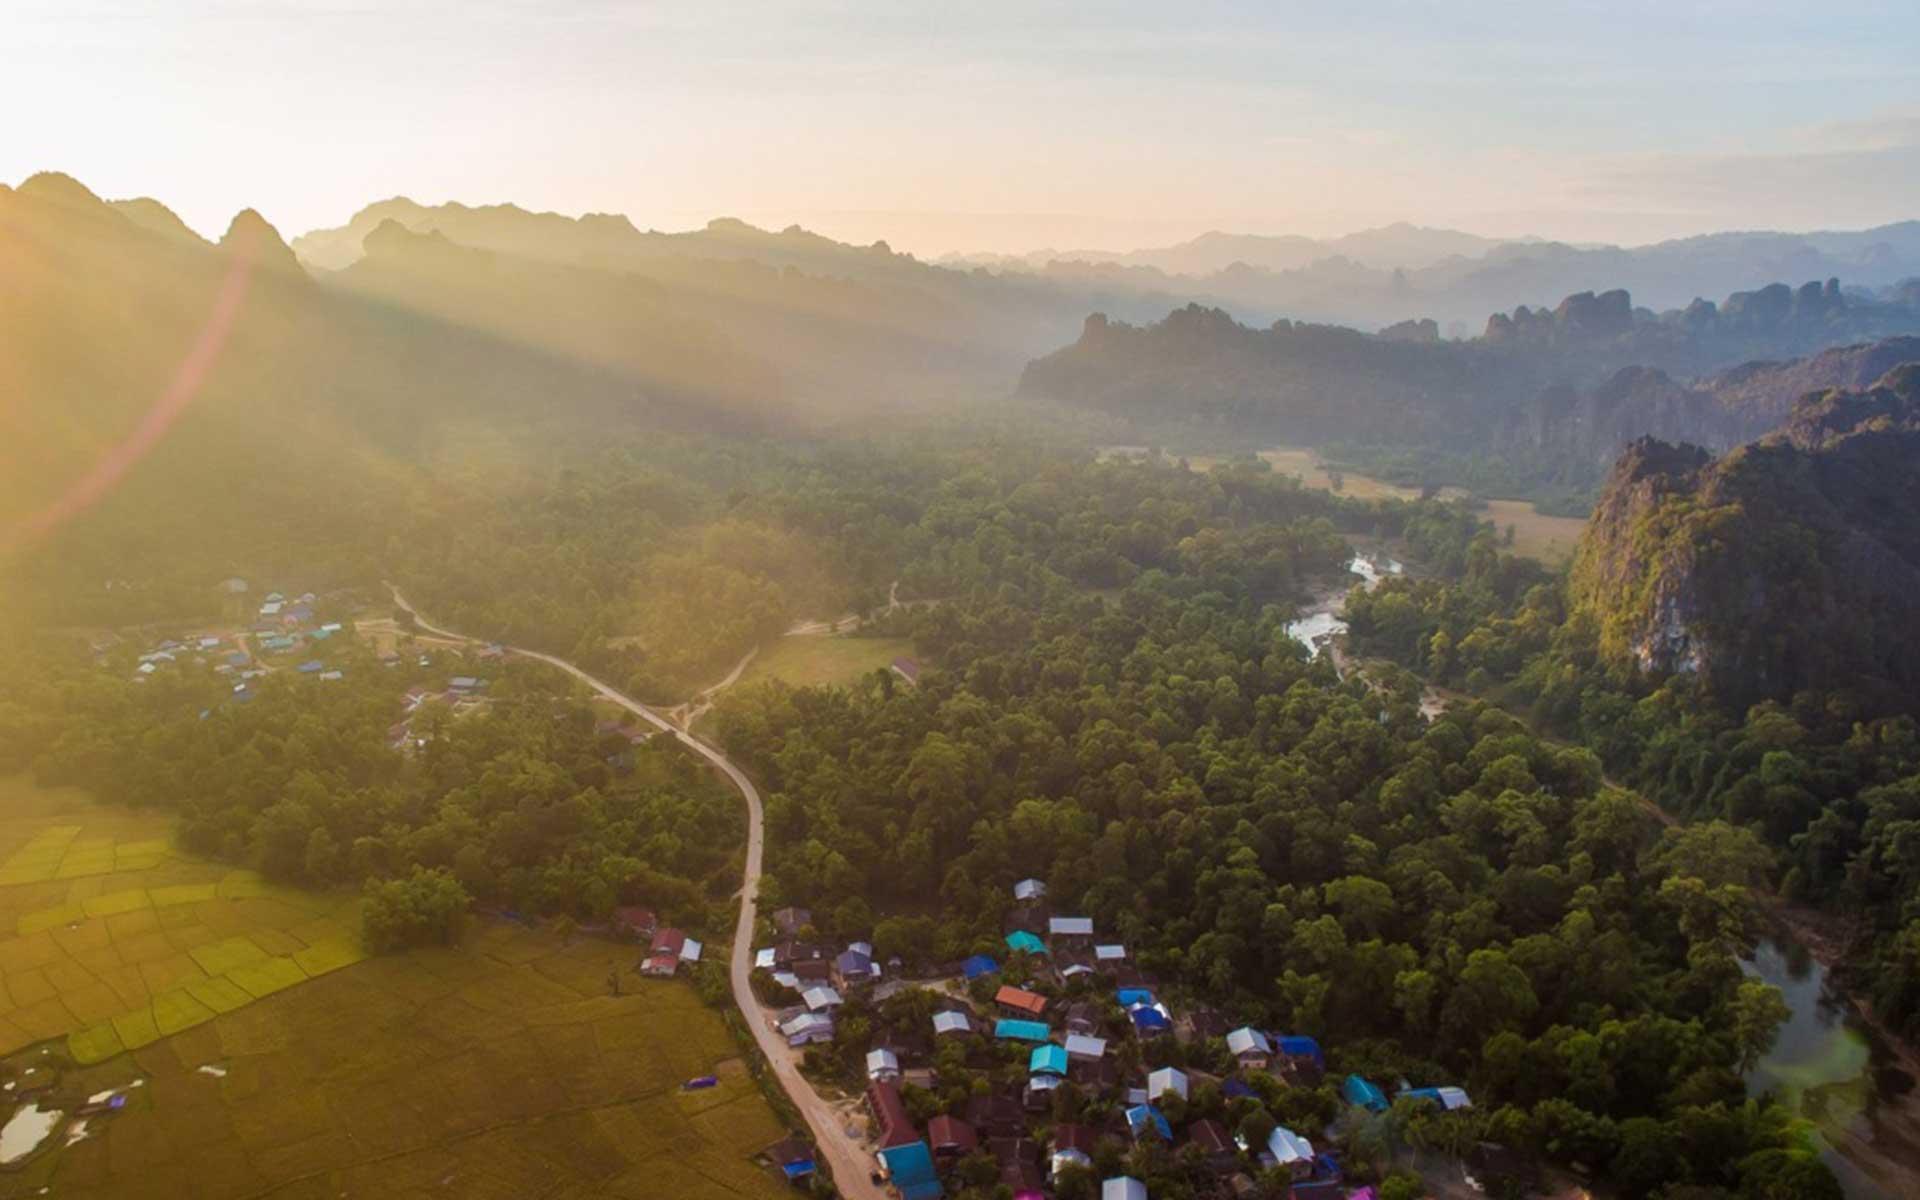 LAOS Laotravel 14 Laos Travel